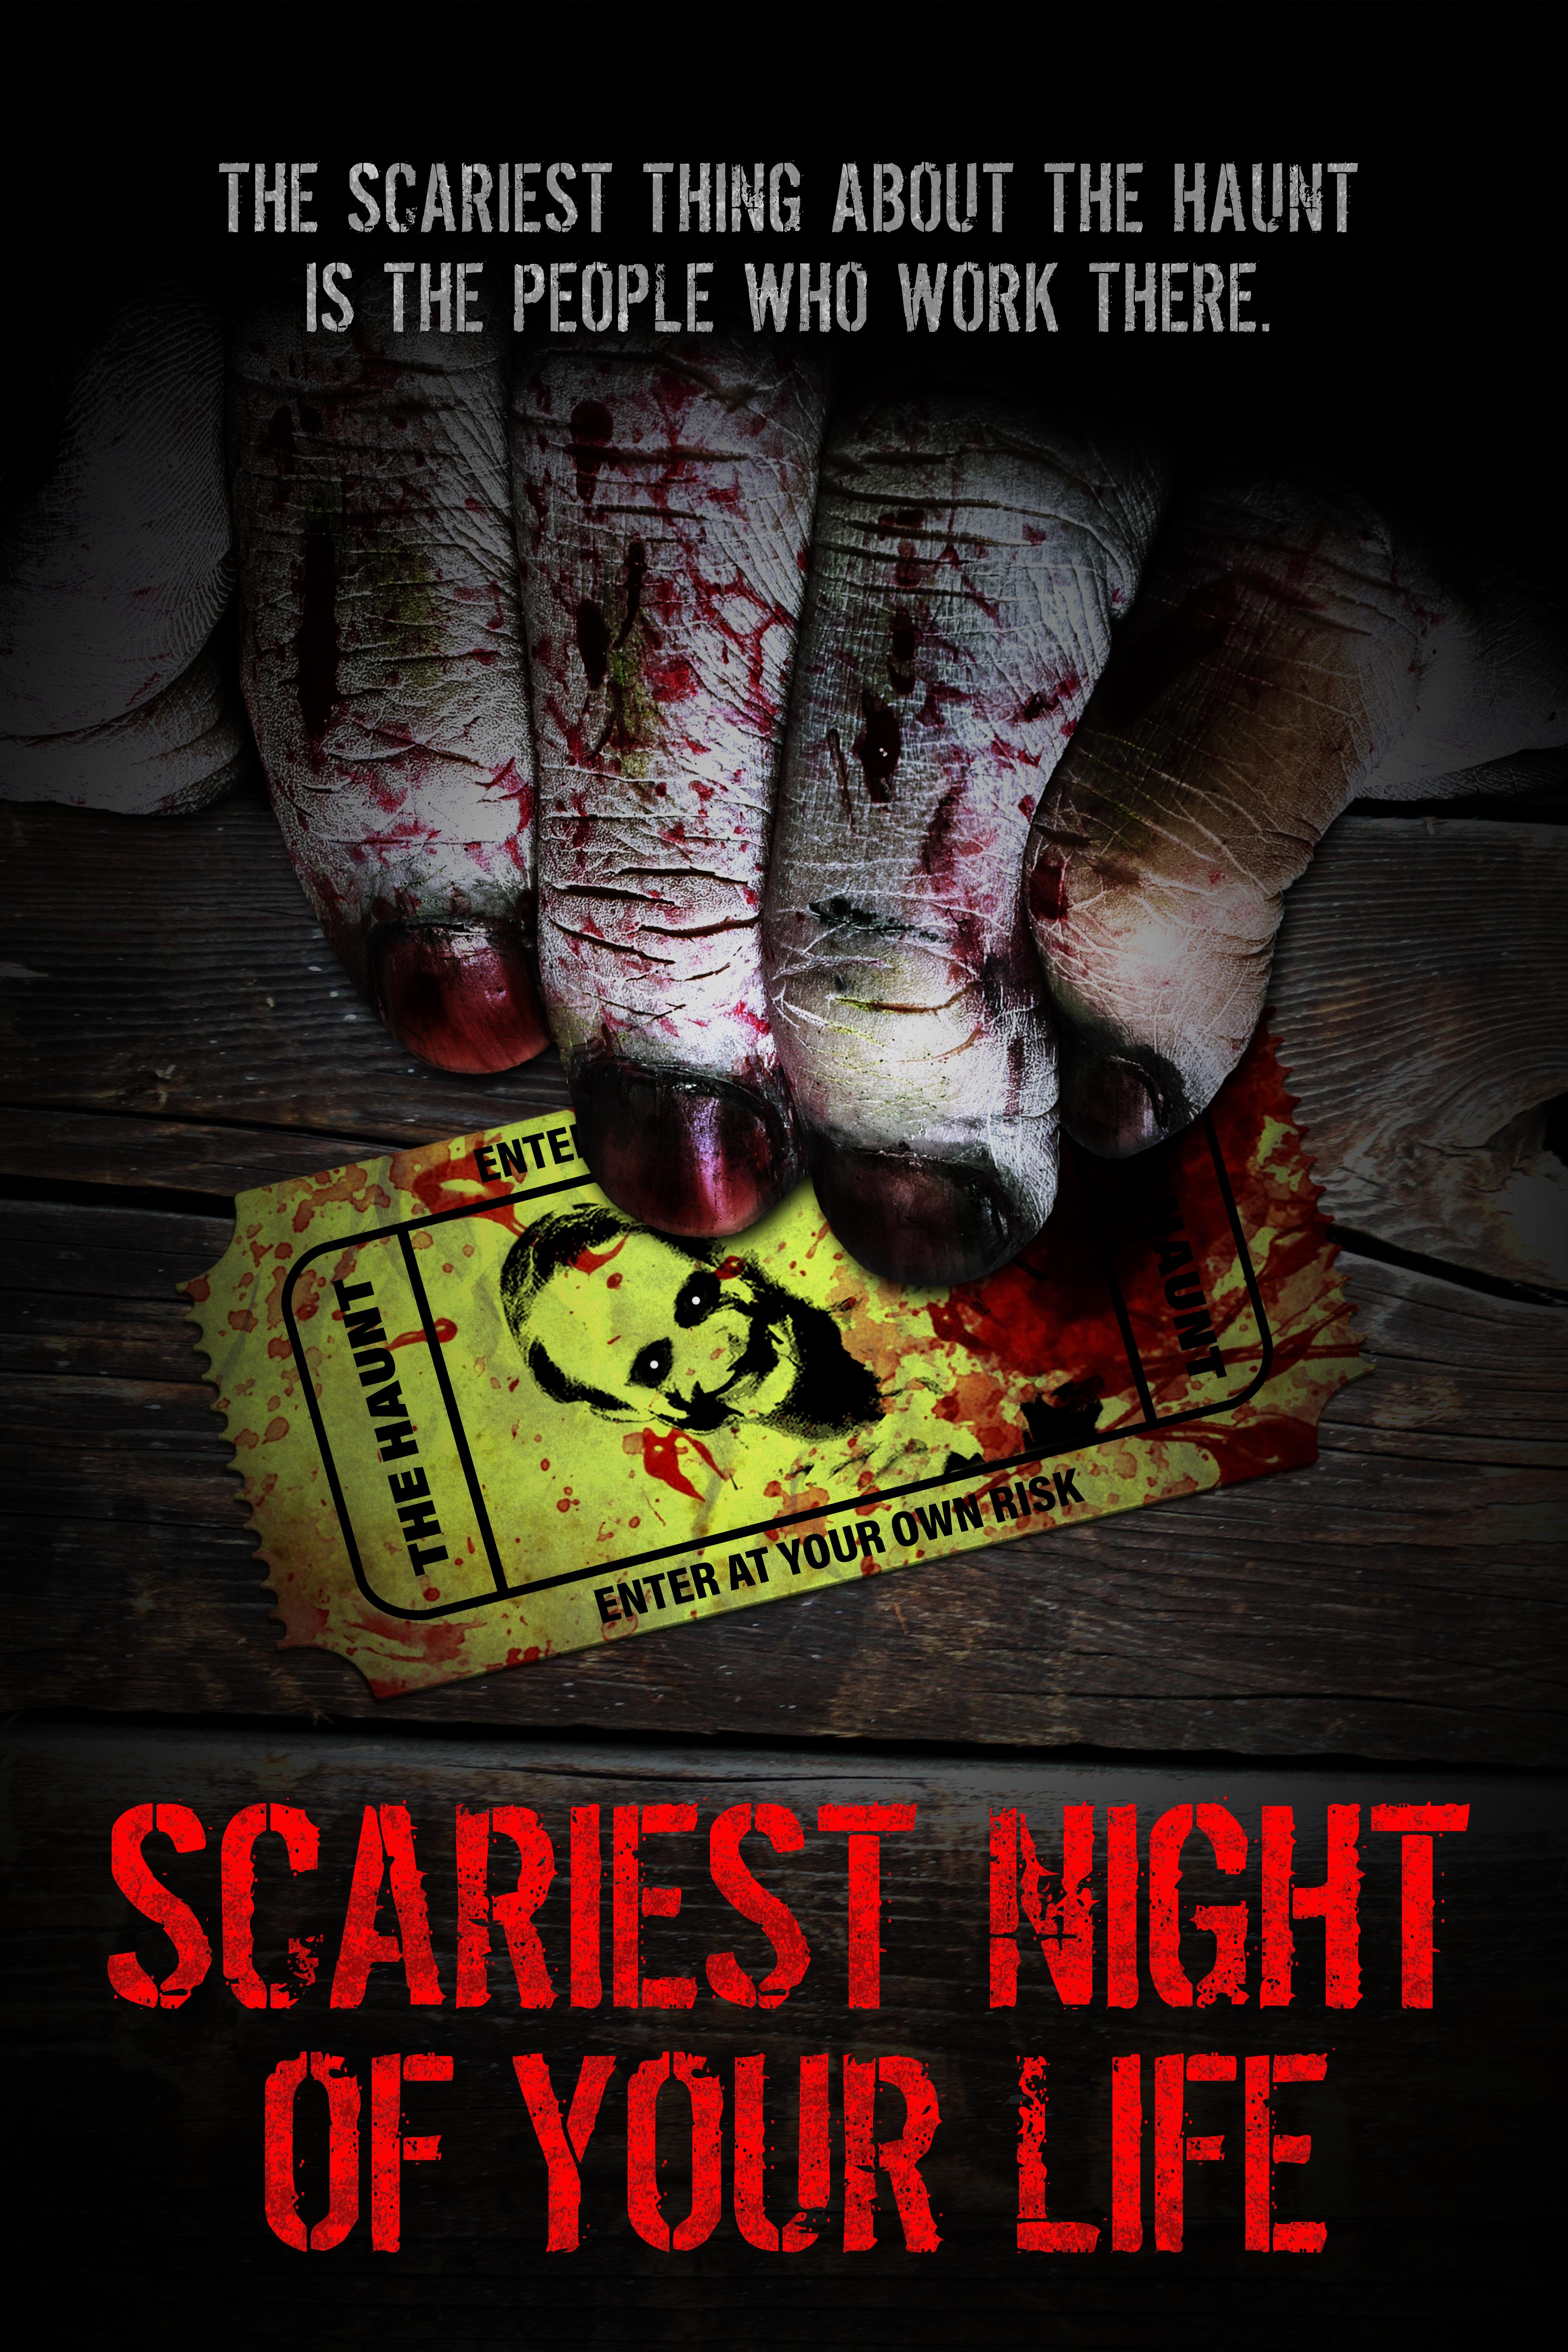 Movie Poster for Halloween Haunt Horror Film